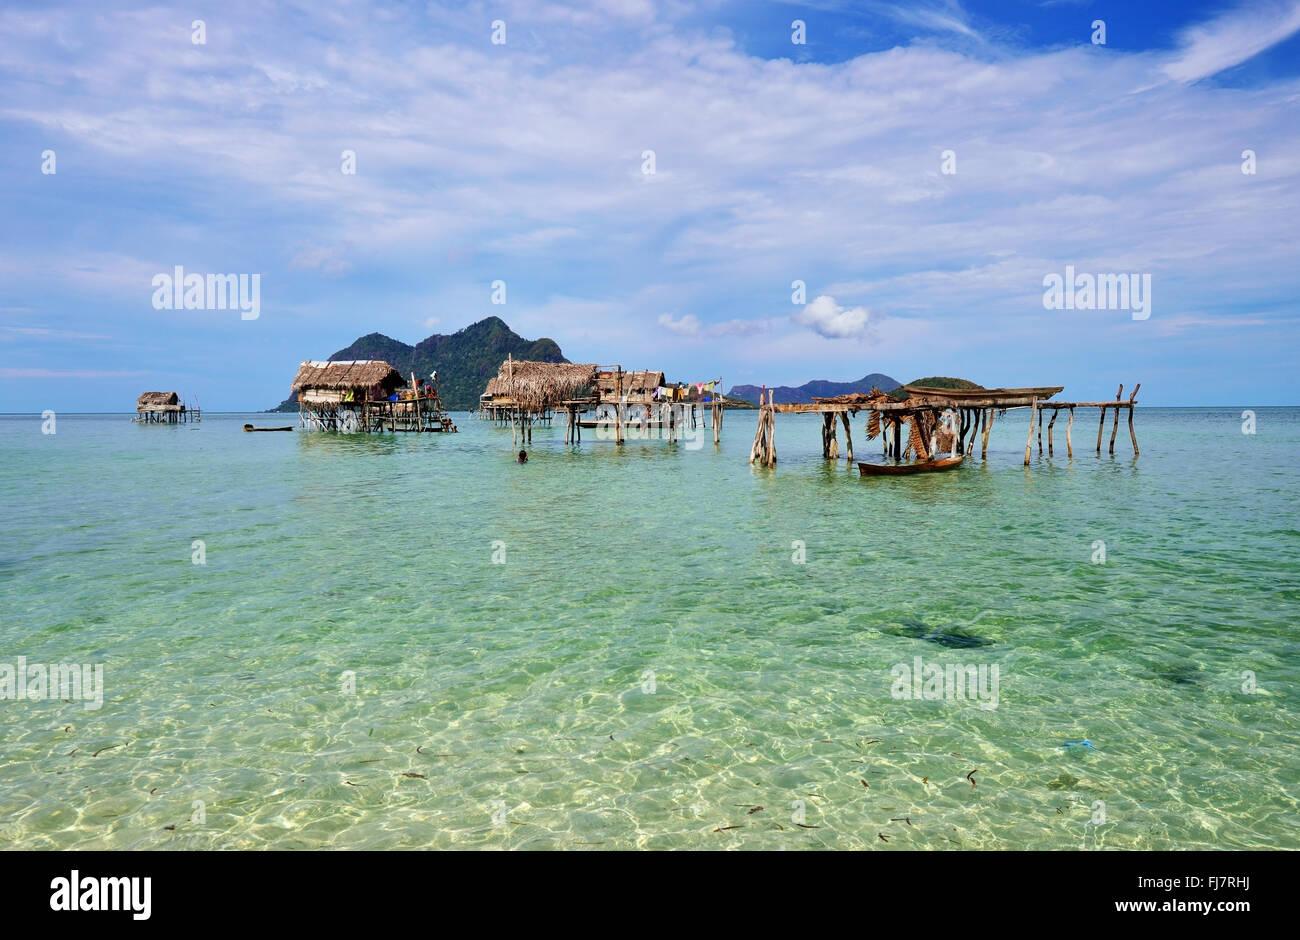 Bajau laut stilt house village in Maiga island, Semporna, Sabah Borneo. - Stock Image